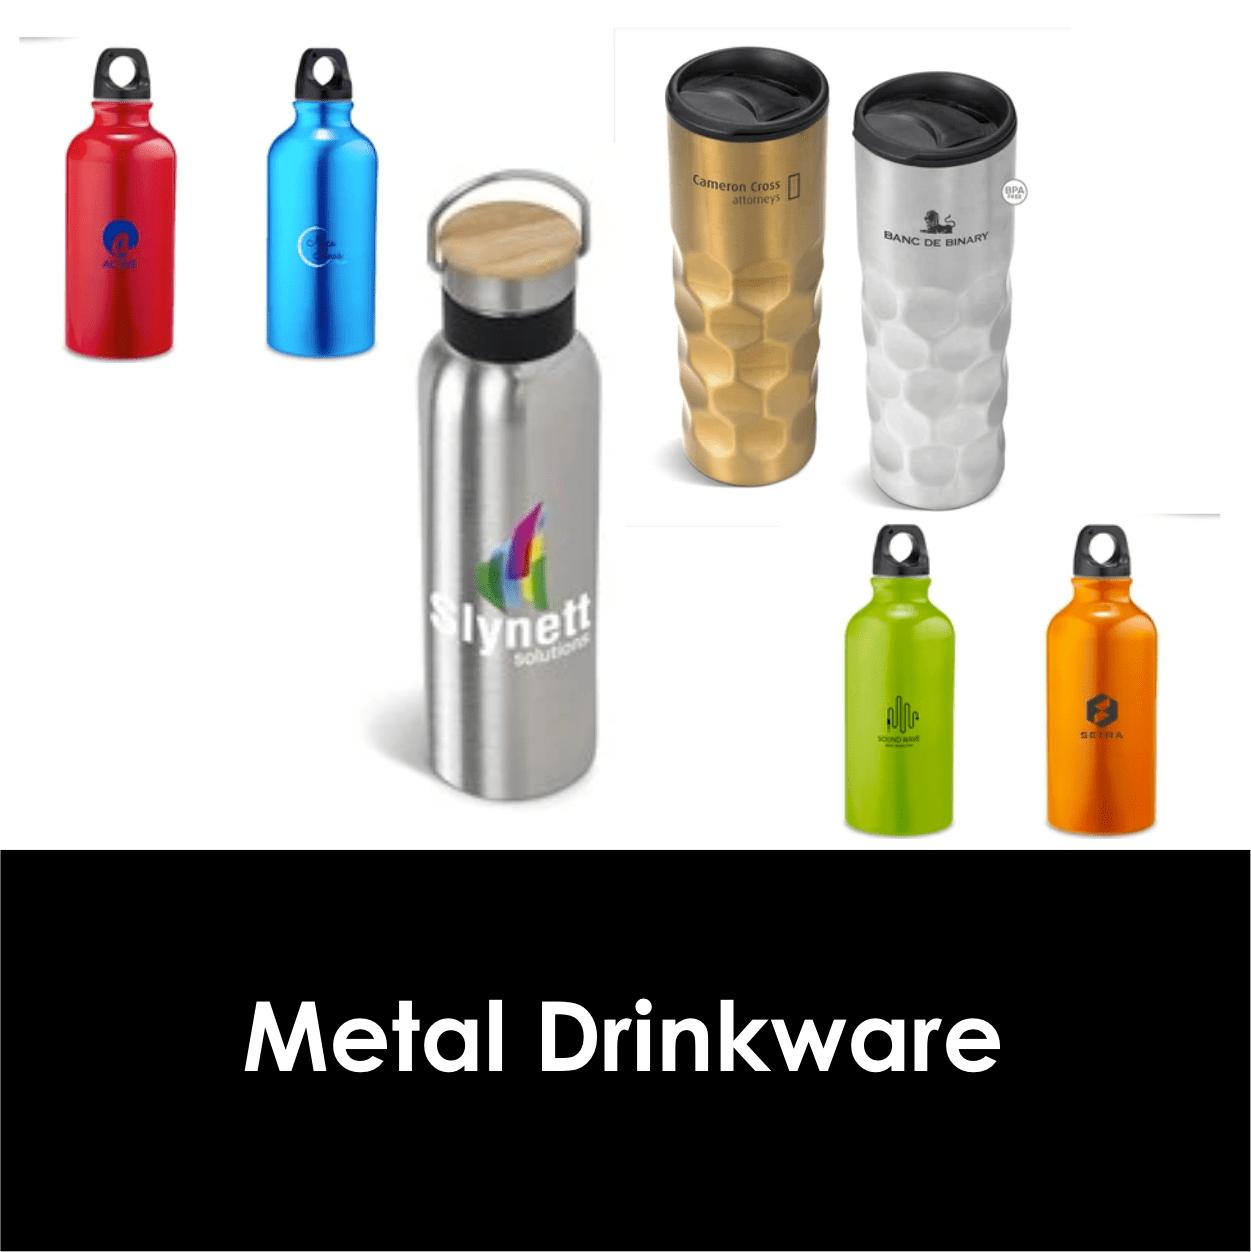 Redblock Advertising Media Metal Drinkware